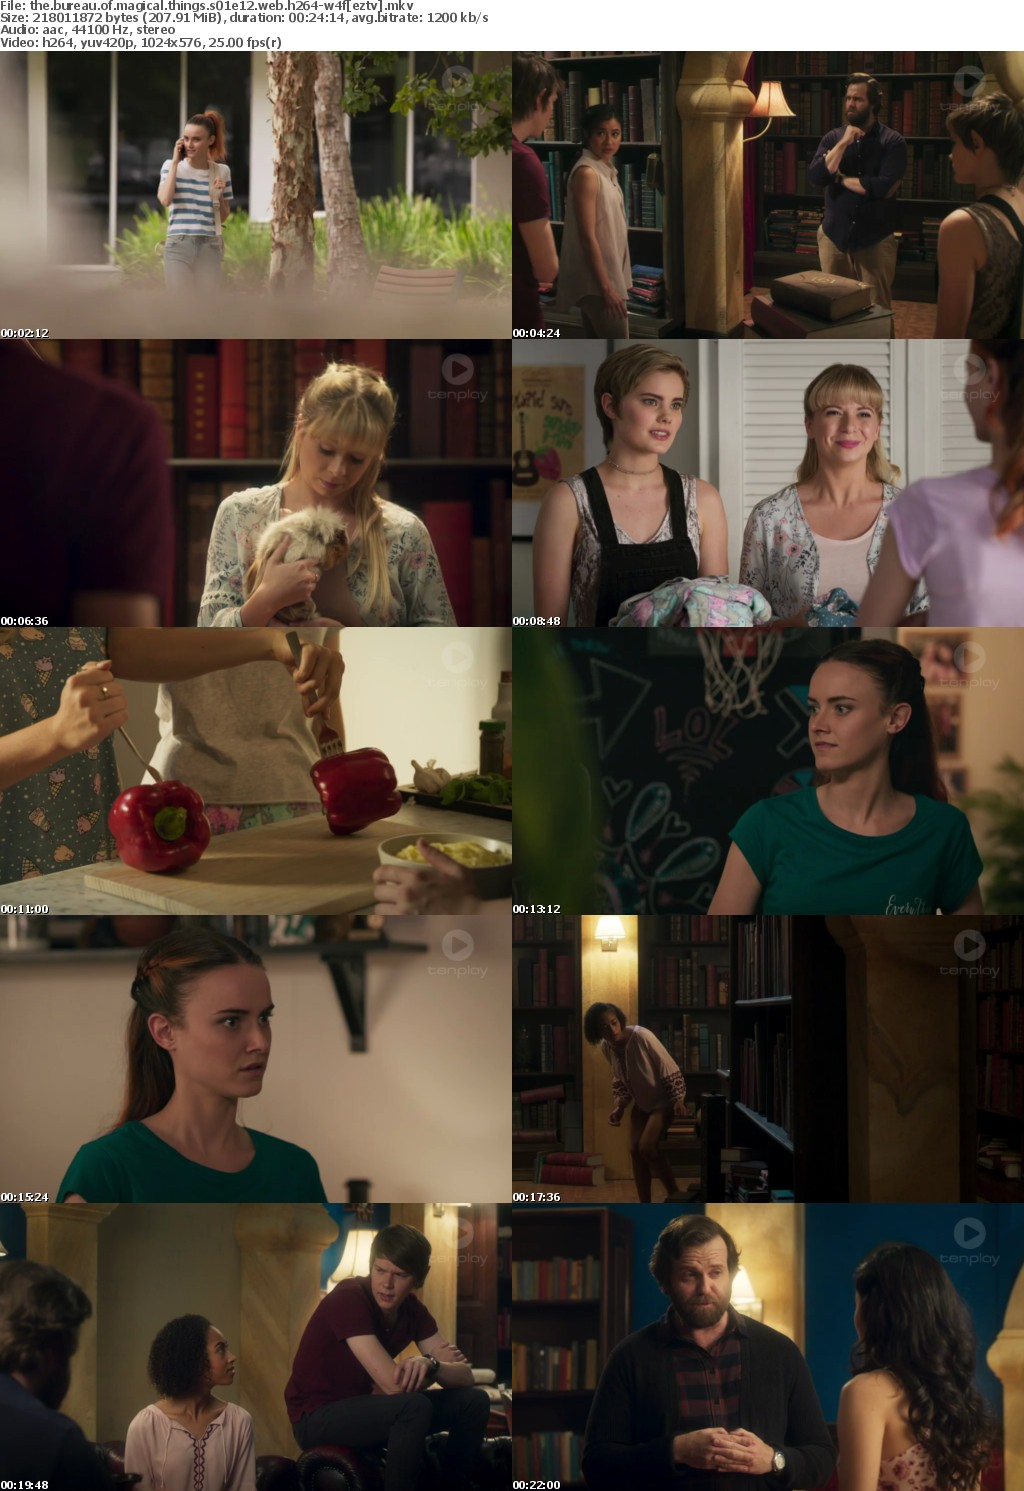 The Bureau of Magical Things S01E12 WEB H264-W4F